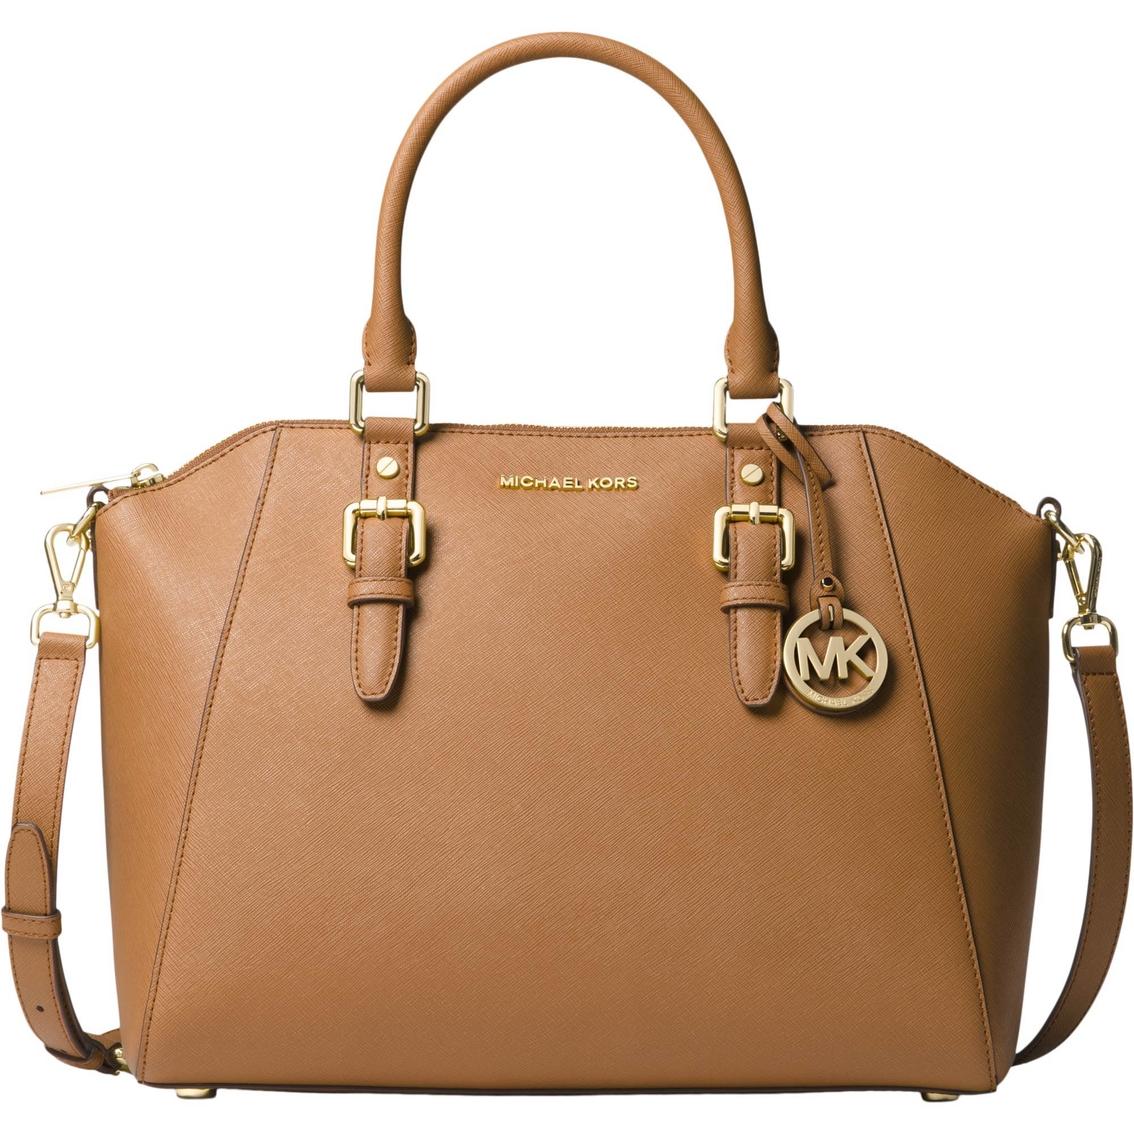 e53db176f283 Michael Kors Ciara Large Top Zip Leather Satchel Goldtone Hardware ...